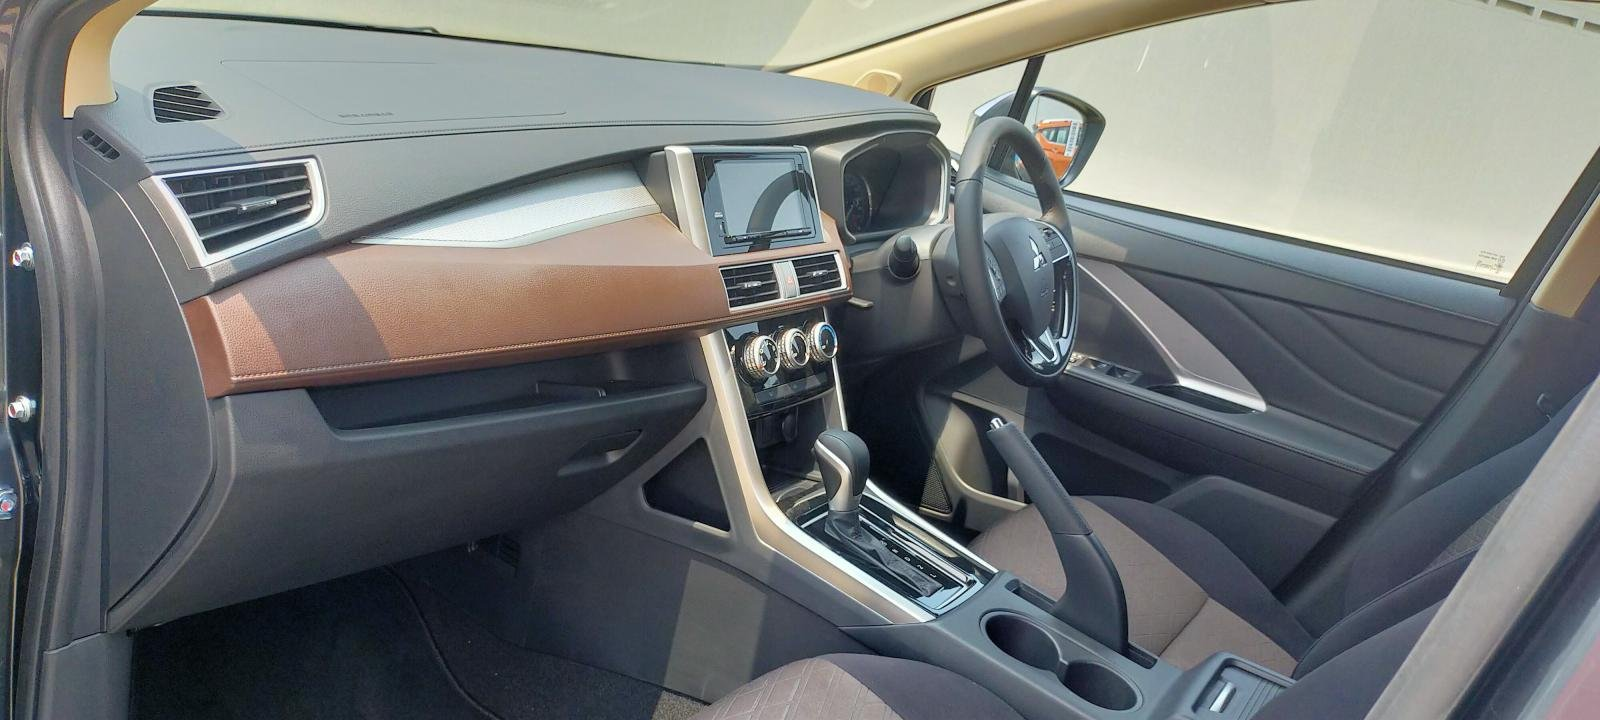 Mitsubishi Xpander Cross 2020 - MPV lai crossover ra mắt.